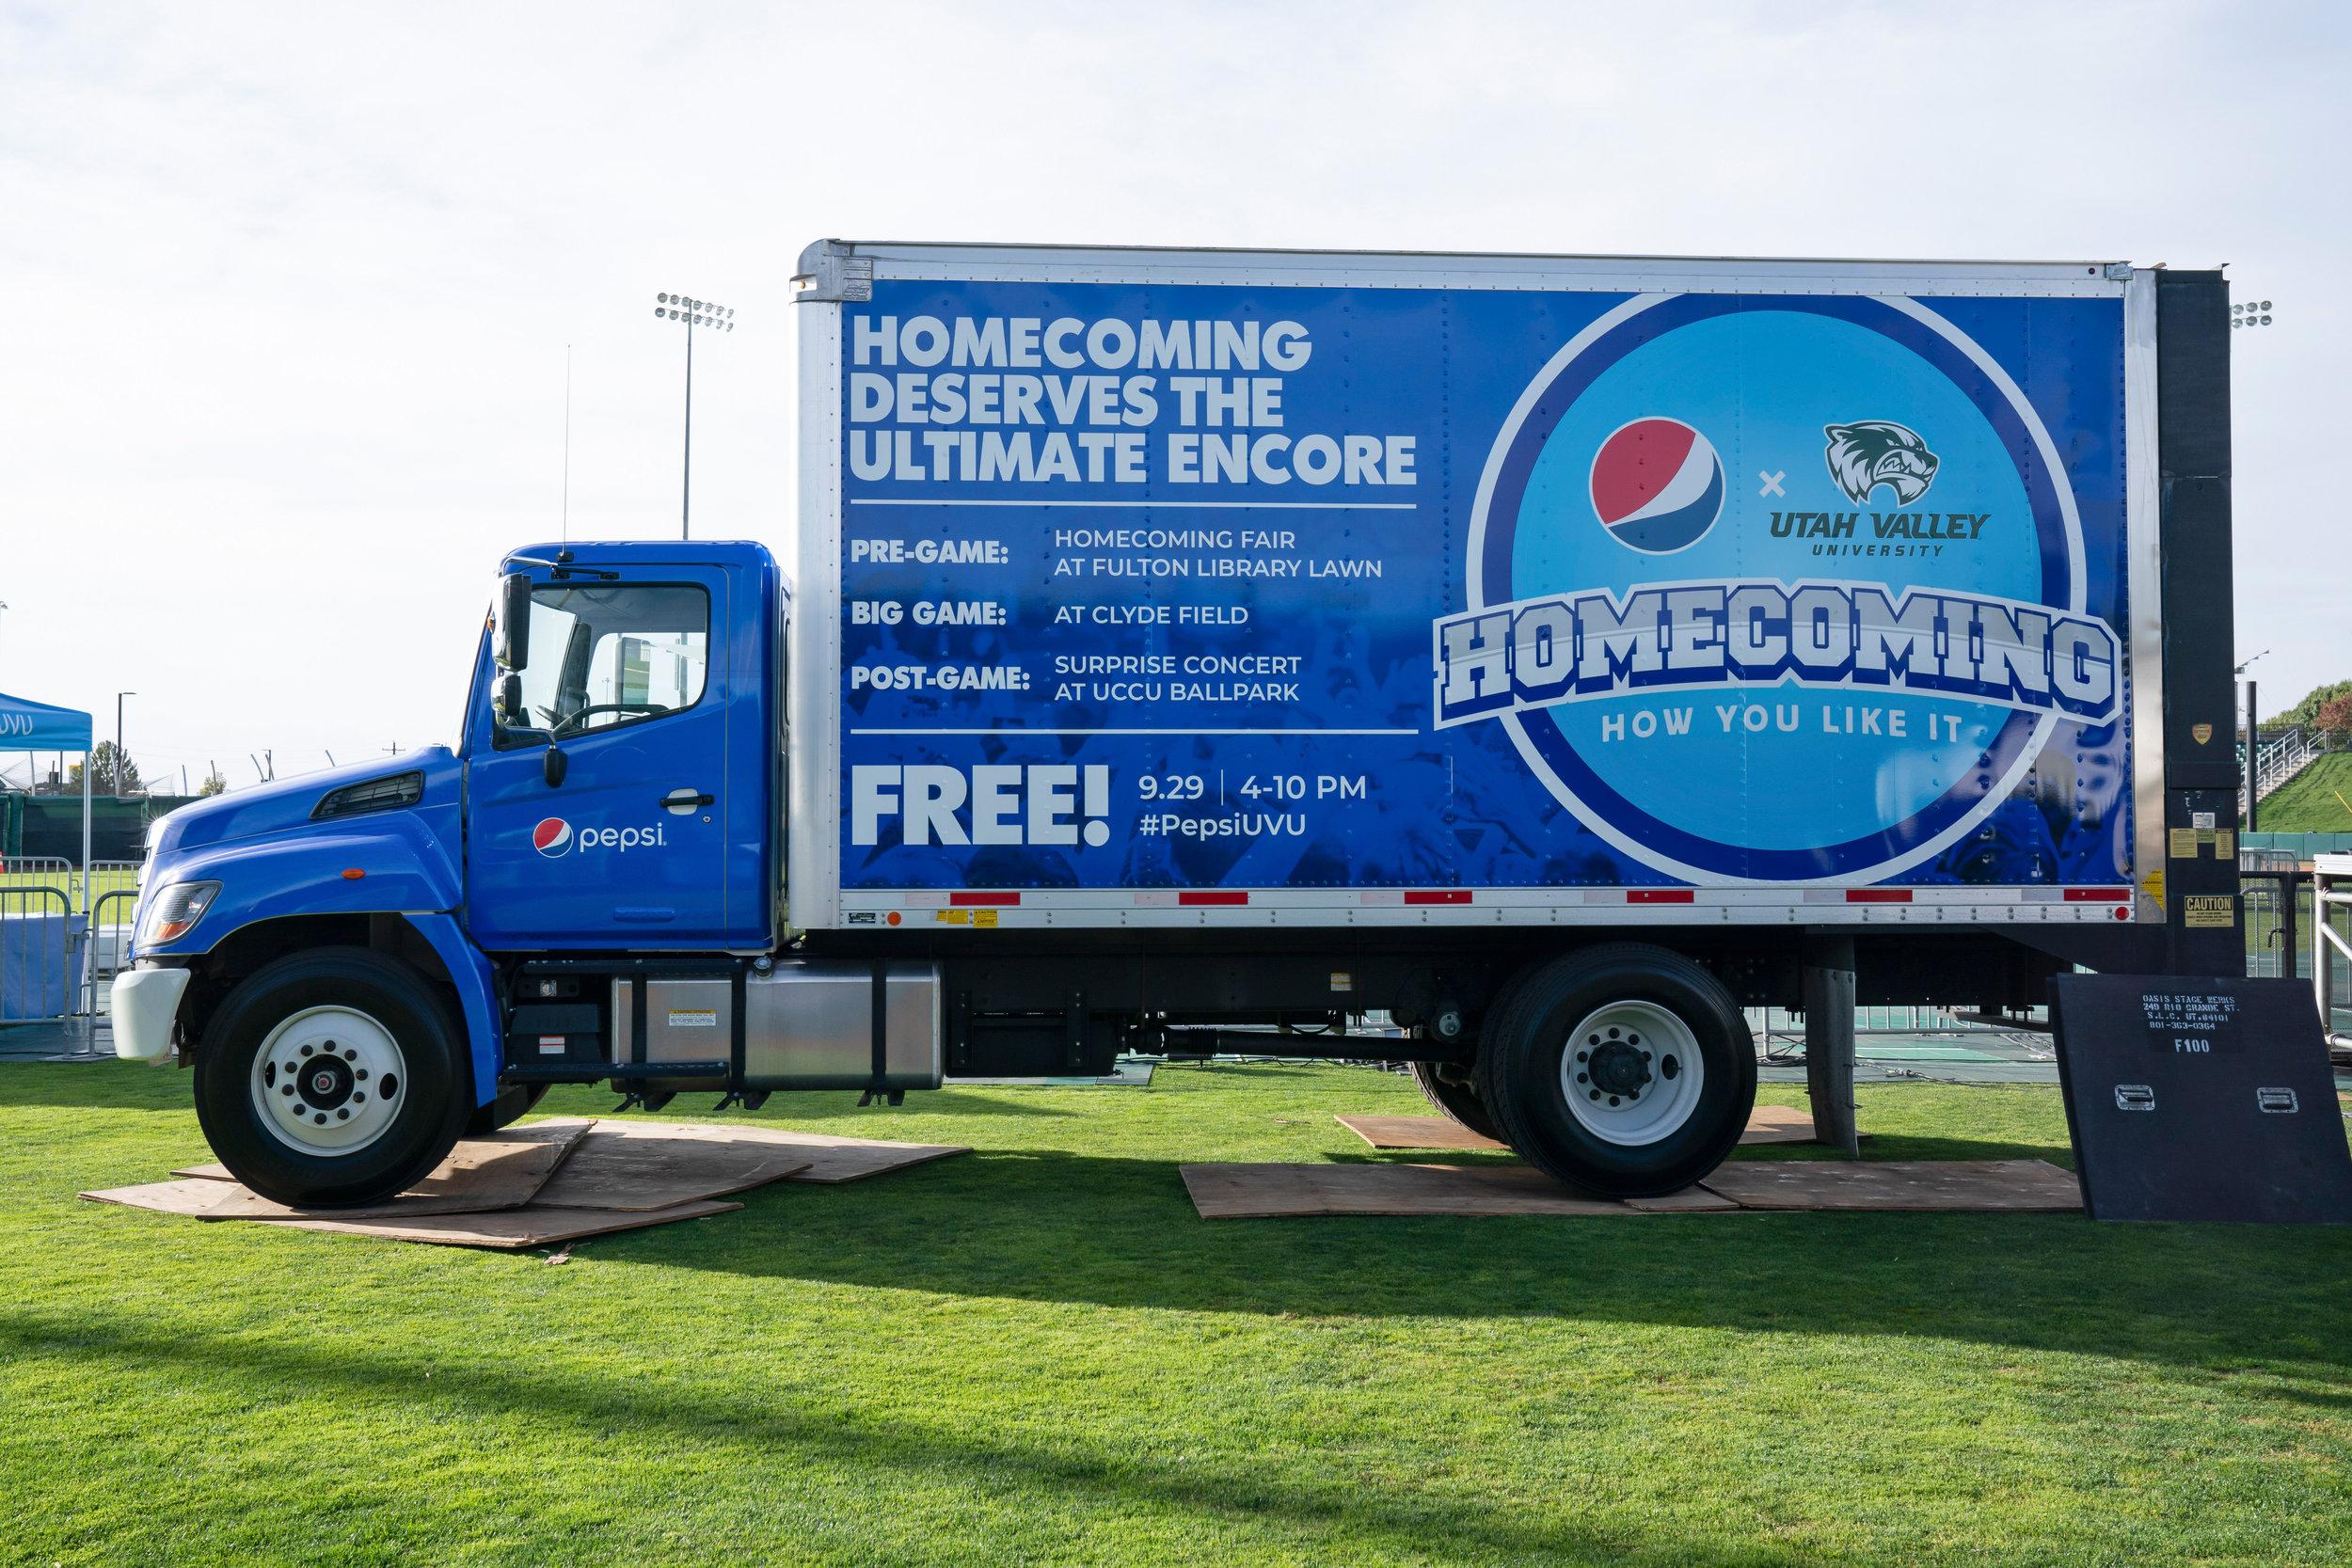 OHelloMedia-Pepsi-UVUHomecoming-9.29-0005.jpg